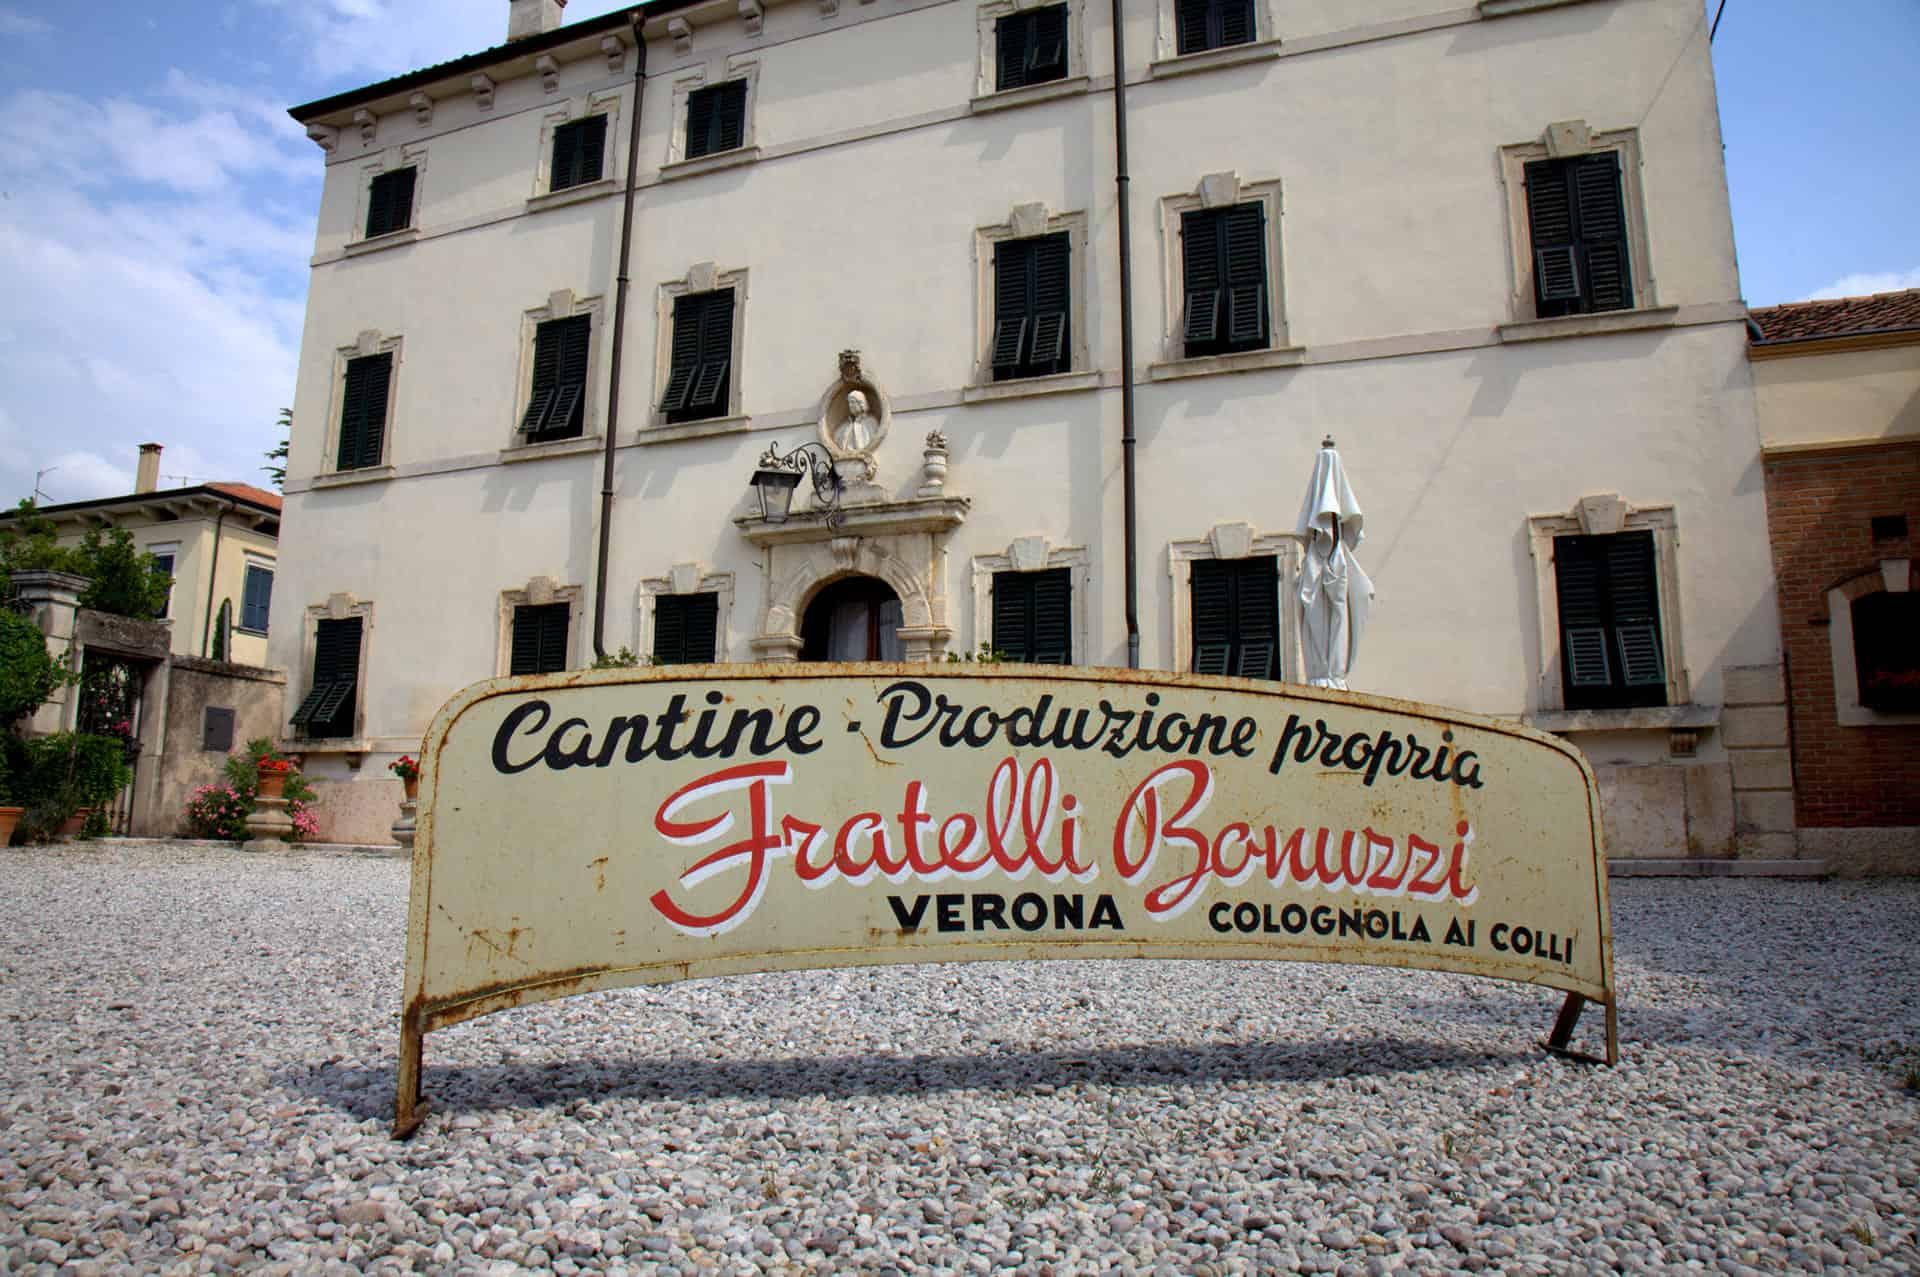 Ingresso alle cantine Villa Canestrari